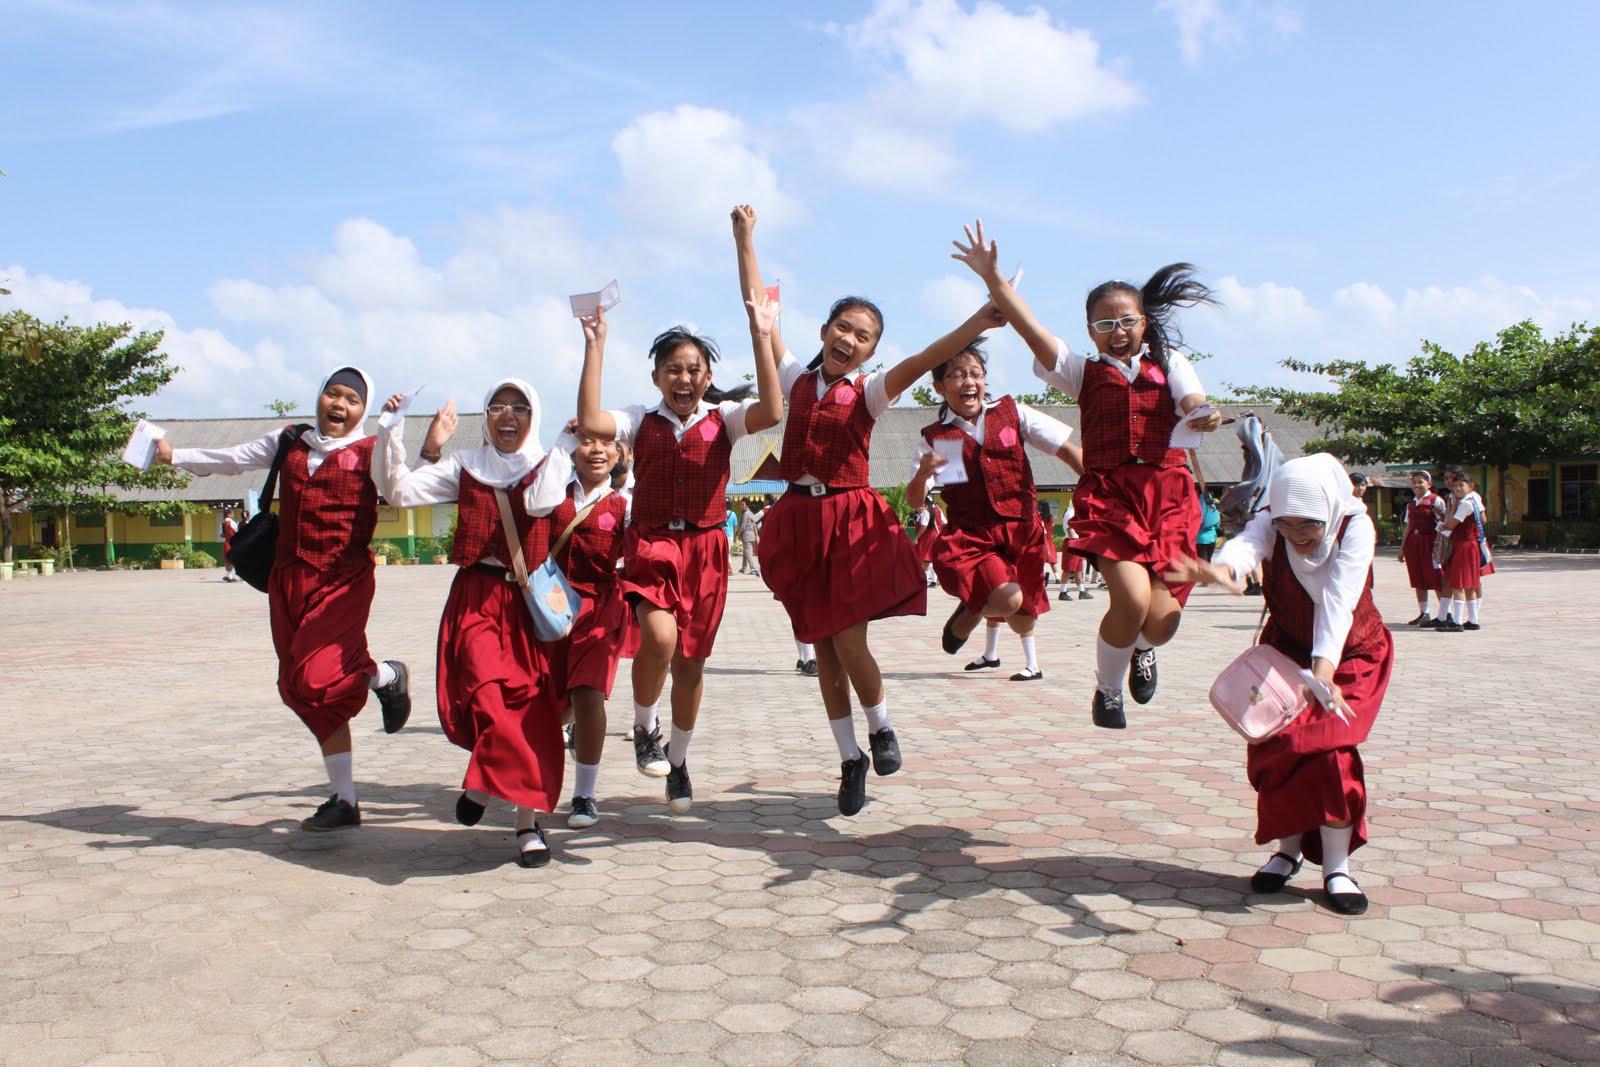 Indonesia anak sma kelas 1 - 3 part 9